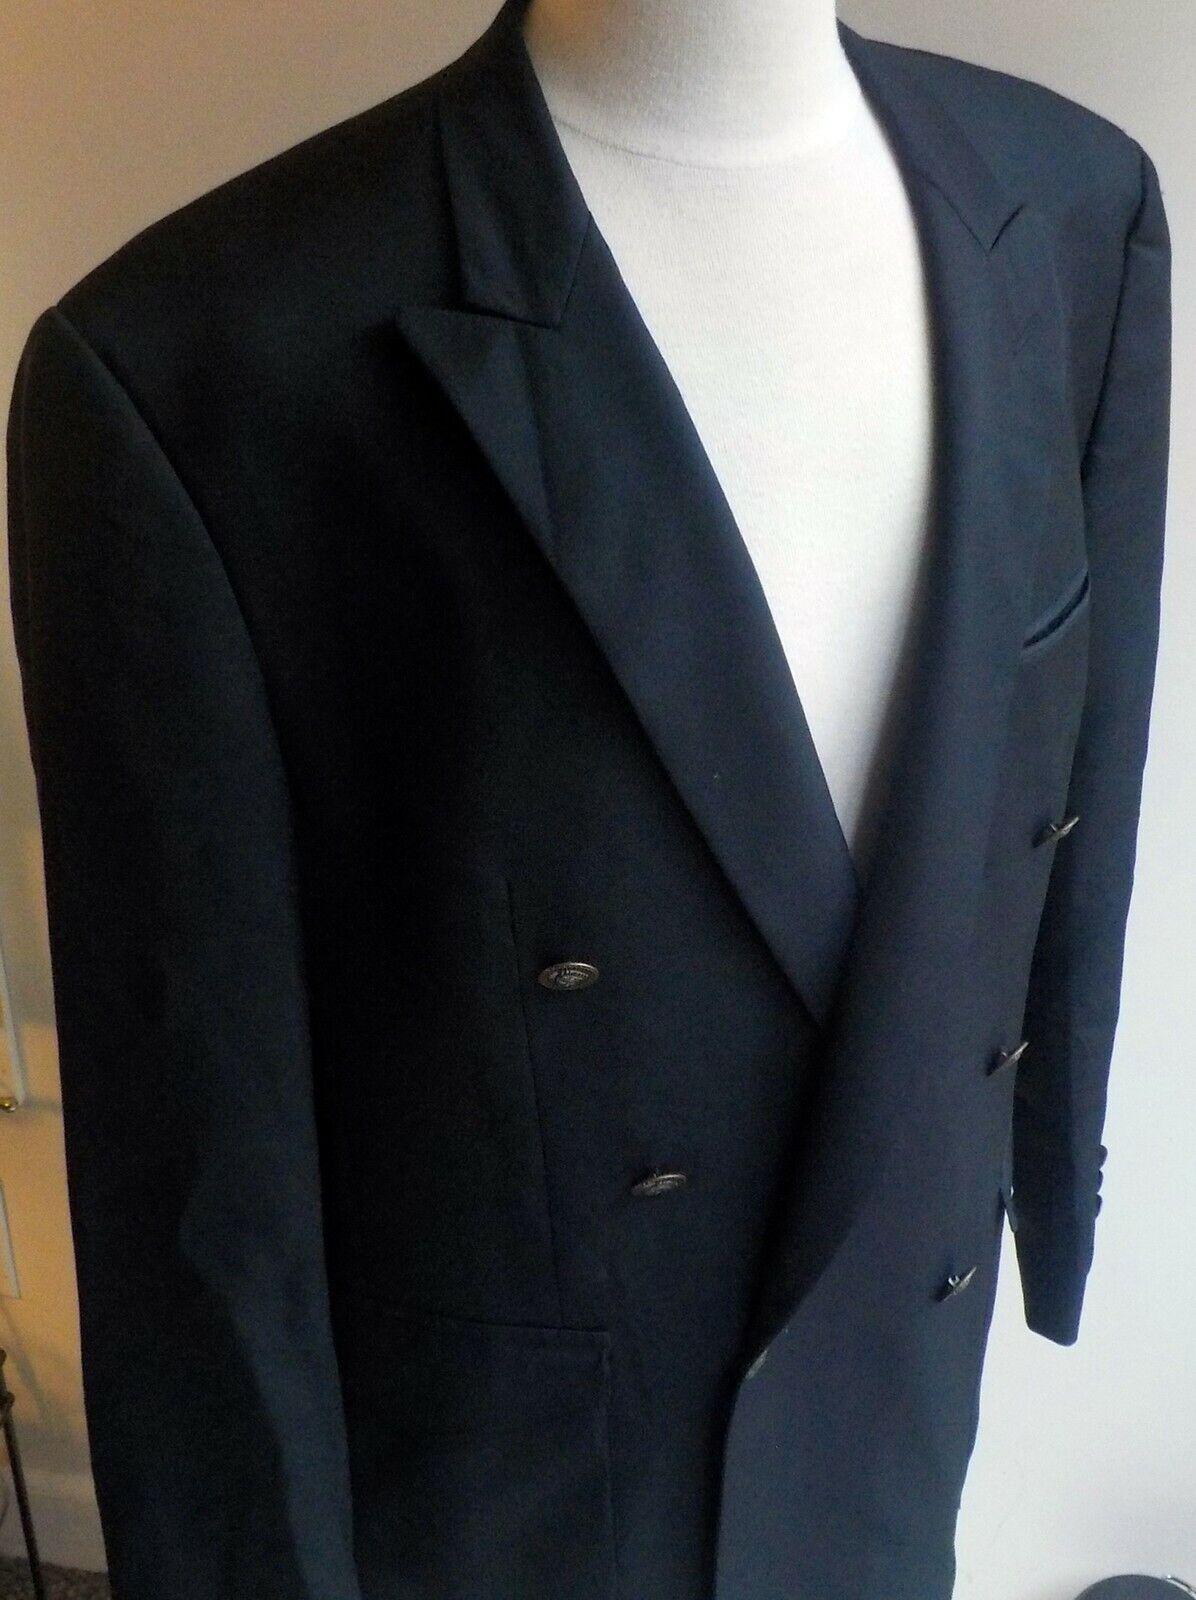 VTG 90s istante Gianni Versace Navy 100% Wool Double Brested Blazer SZ 44